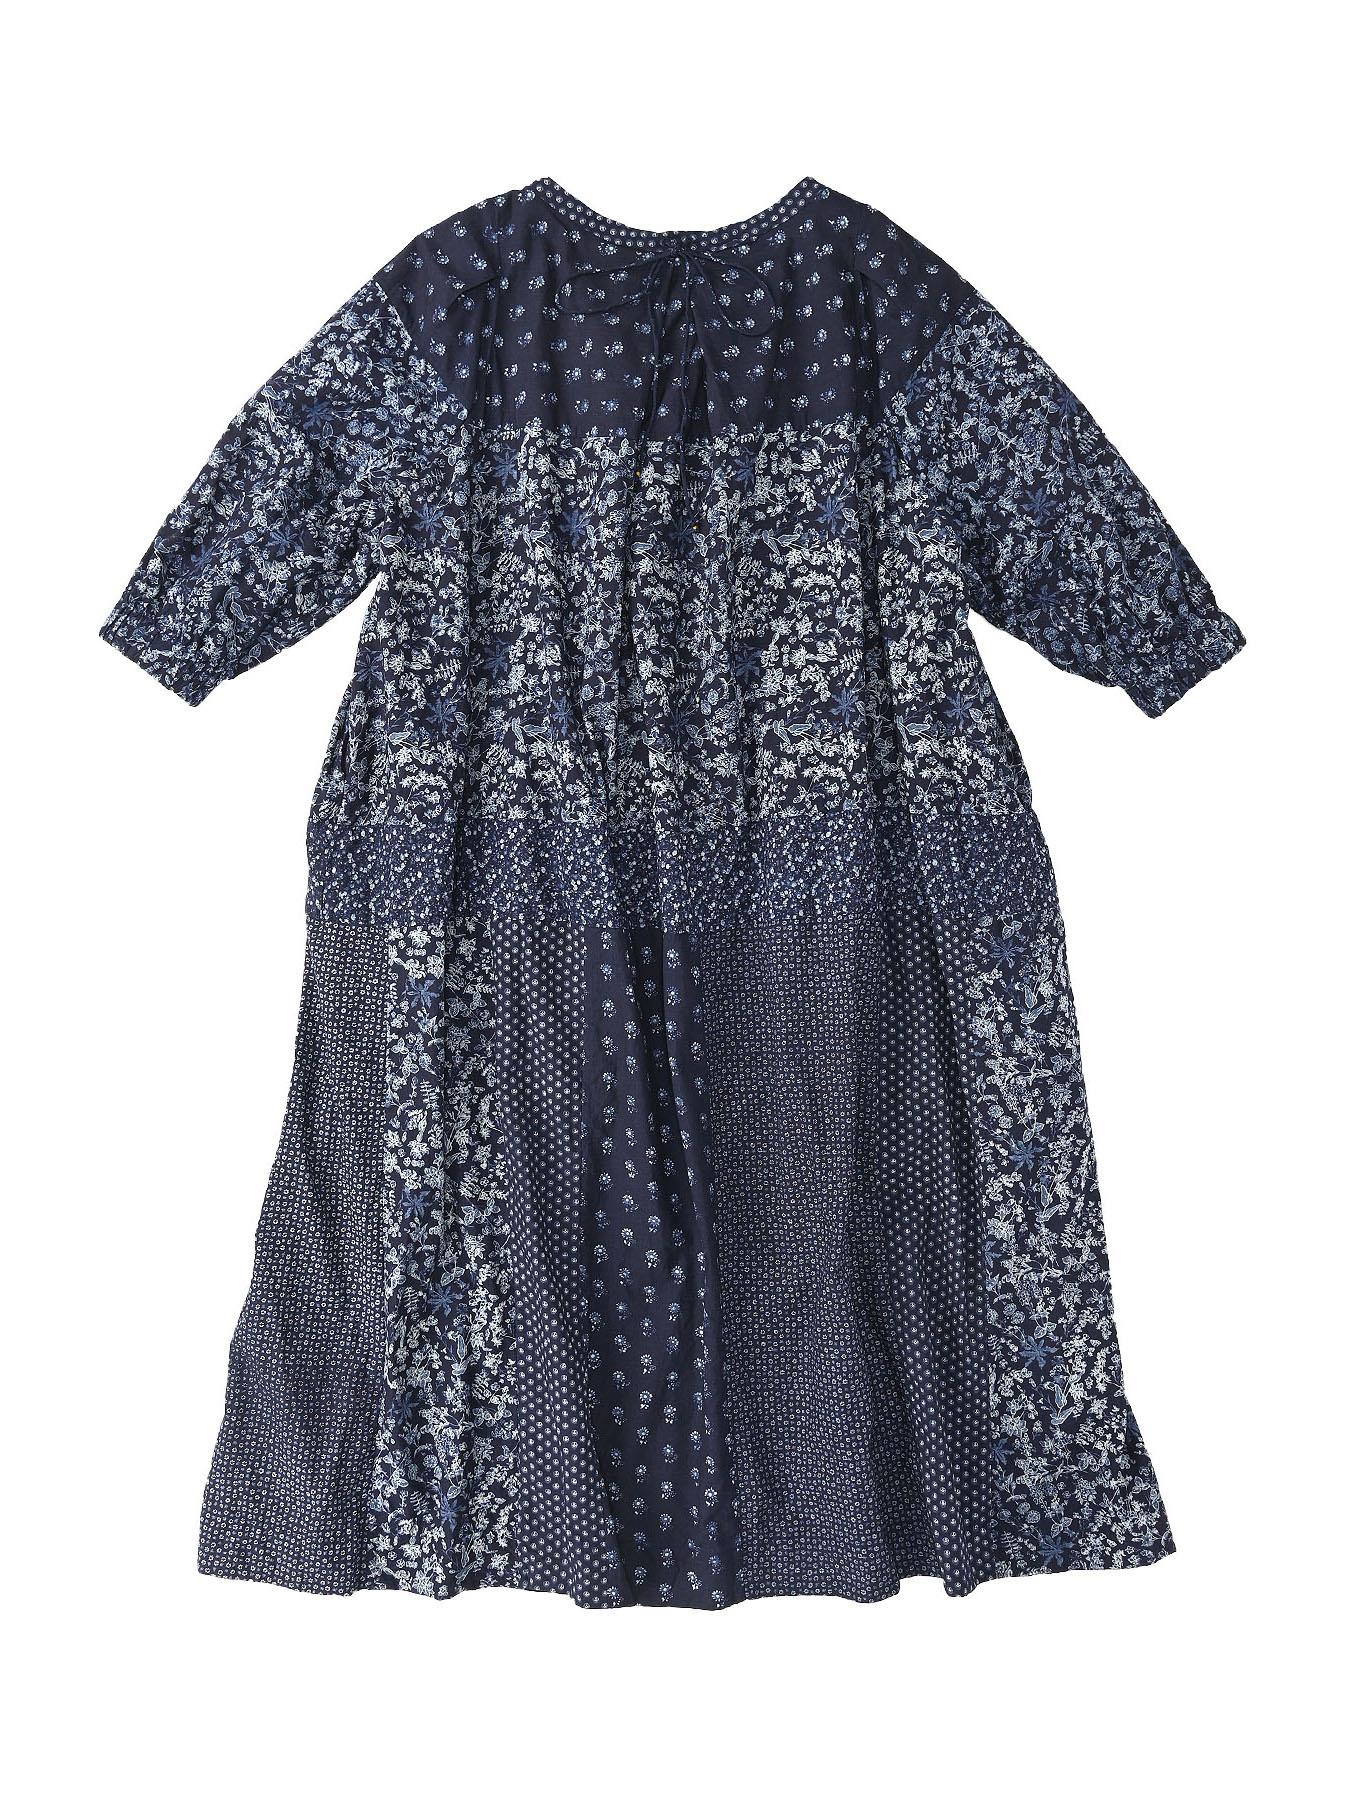 Indigo Tappet Flower Patchwork Dress-5